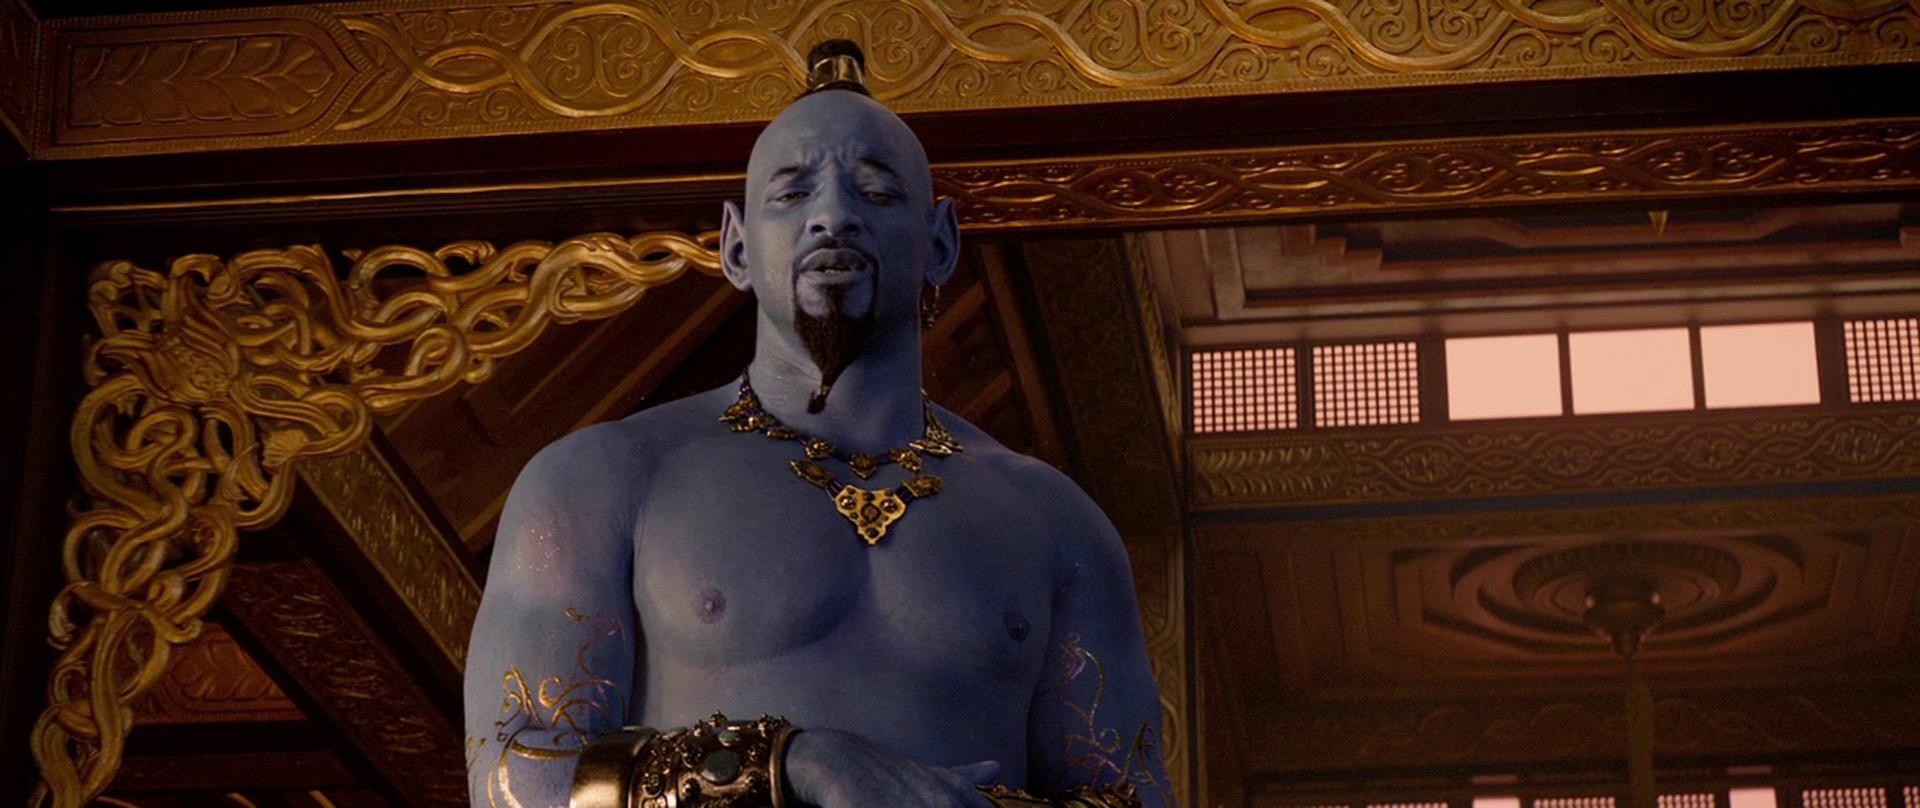 Aladdin | 2019 | BDRip | XviD | Türkçe Dublaj | m720p - m1080p | BluRay | Dual | TR-EN | Tek Link